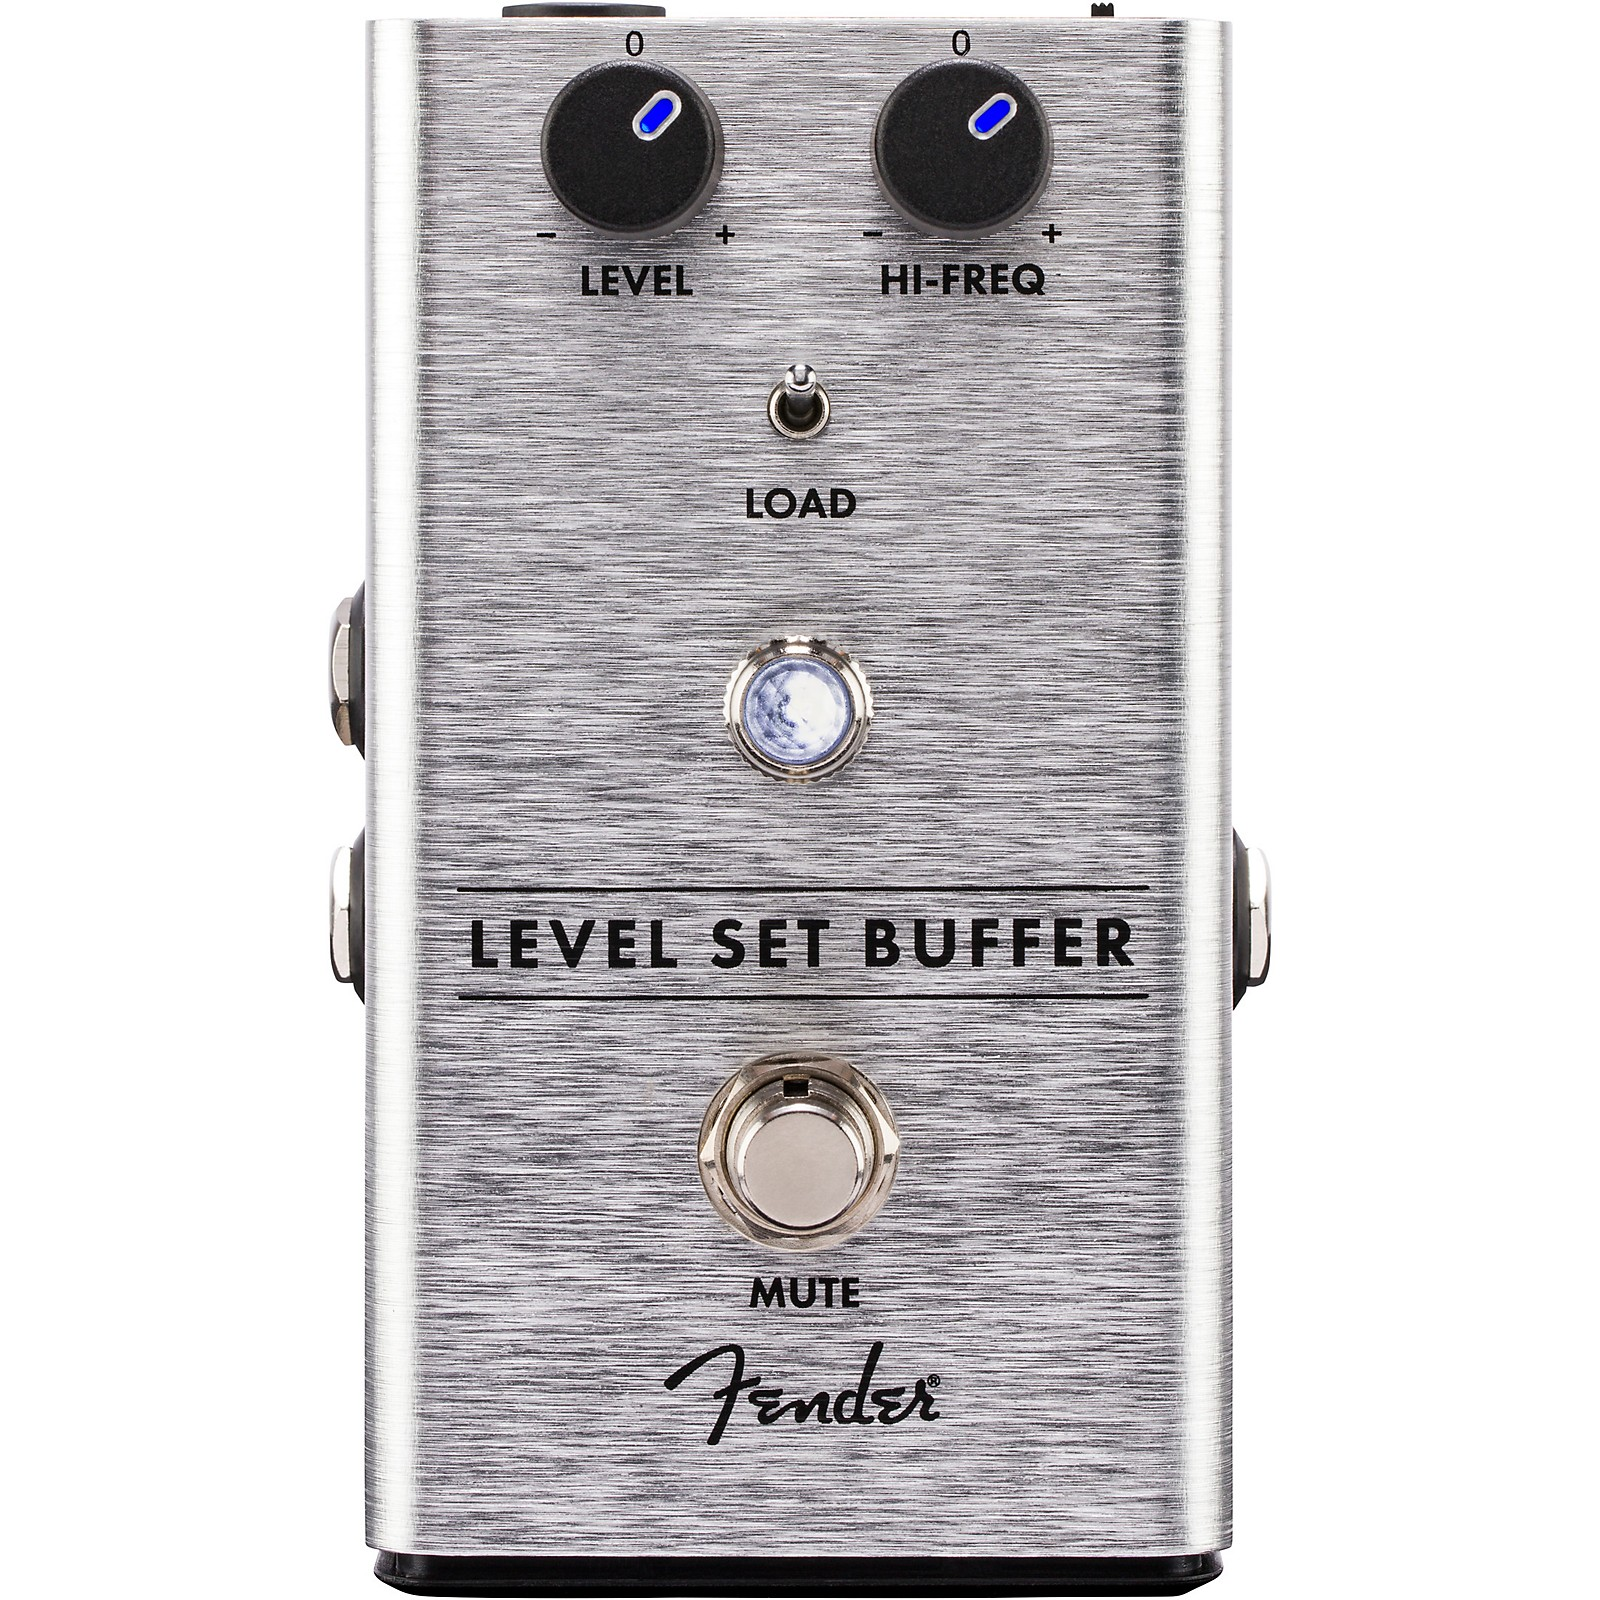 Fender Level Set Buffer Effects Pedal